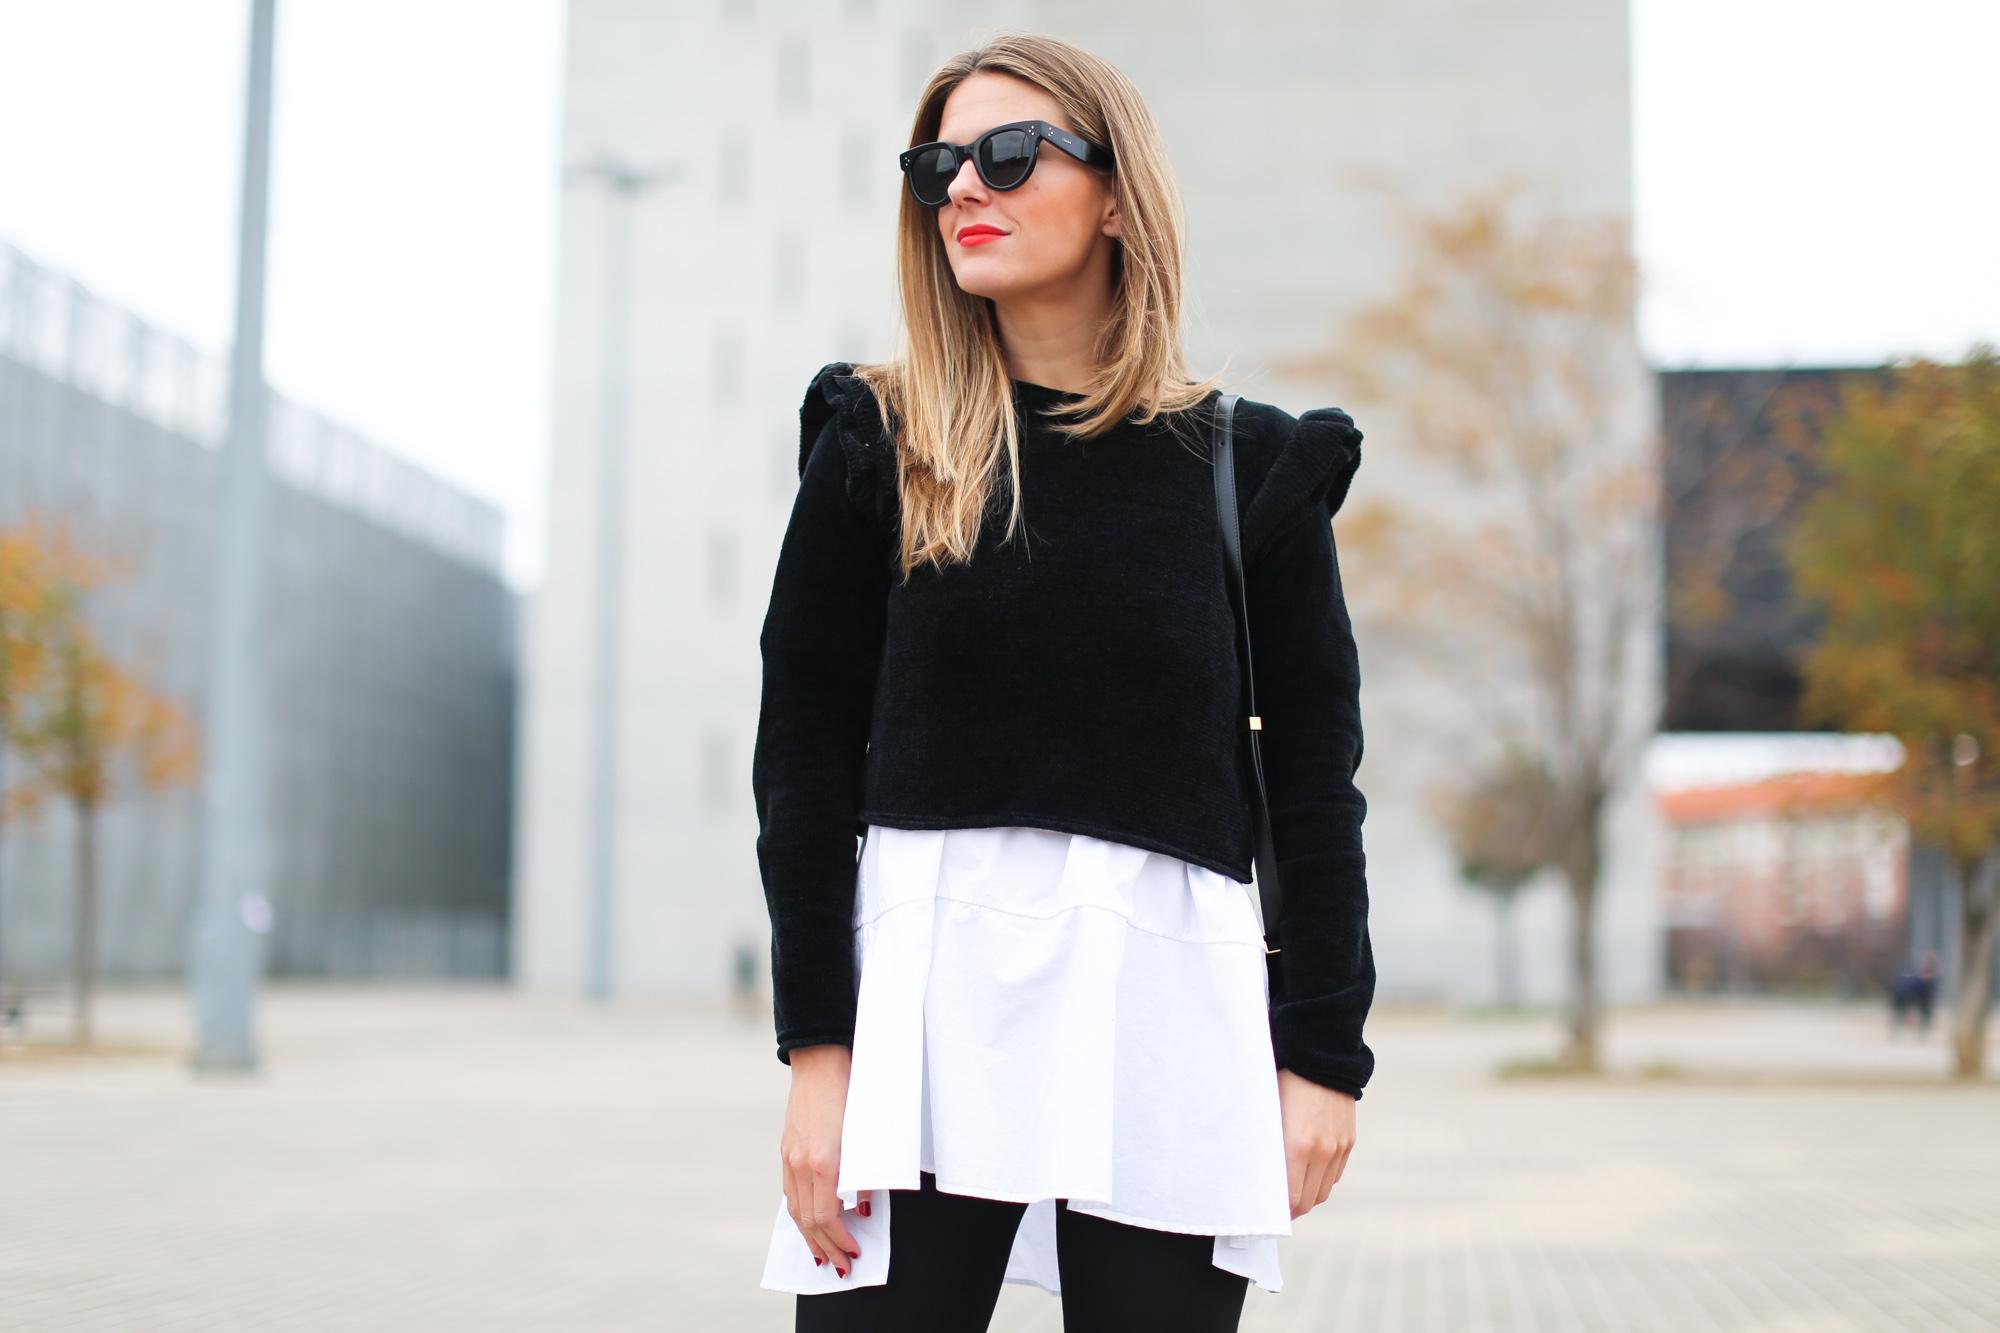 Clochet_streetstyle_fashionblogger_bilbao_yvessaintlaurentbeauty_Blackopiumeaudeparfum_rougerpurcouturecollector_toucheeclat_couturebrowpalette_maquillajenavidad_-6